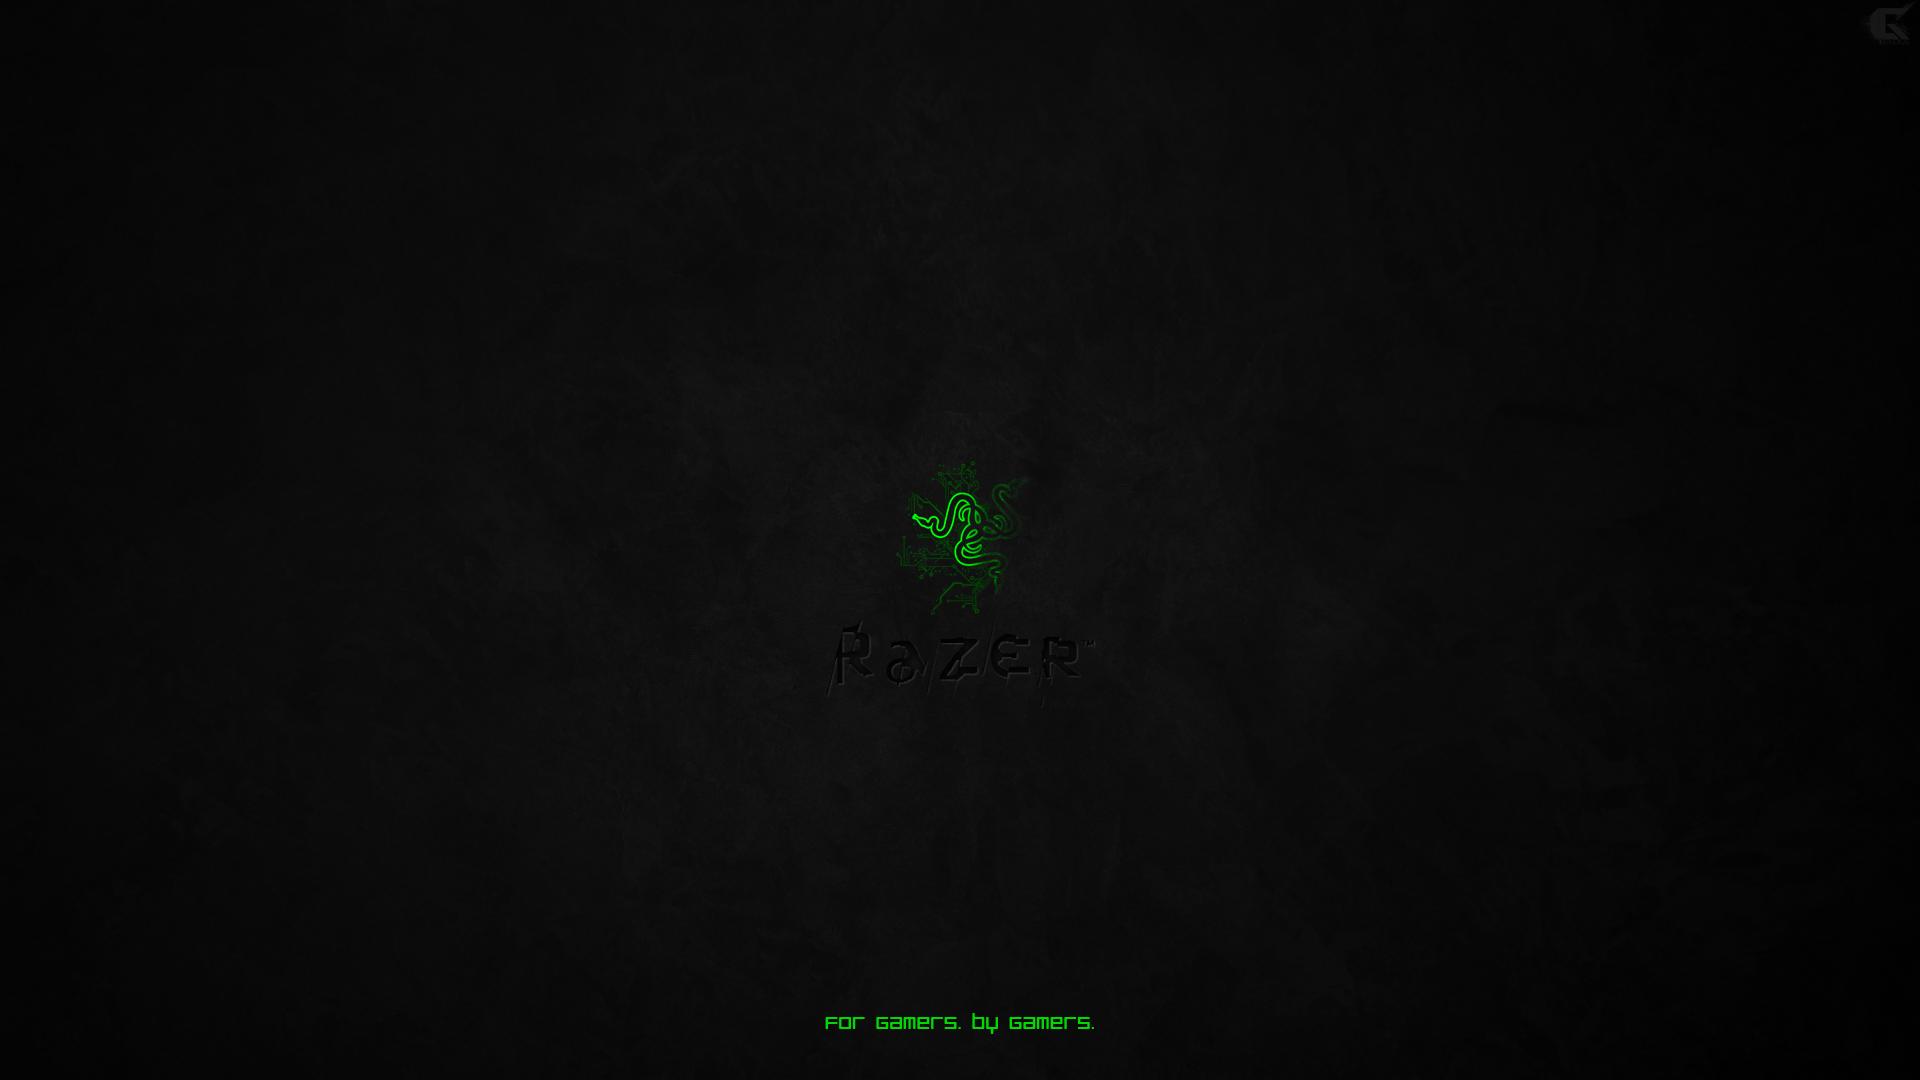 Razer Desktop Backgrounds 1920x1080